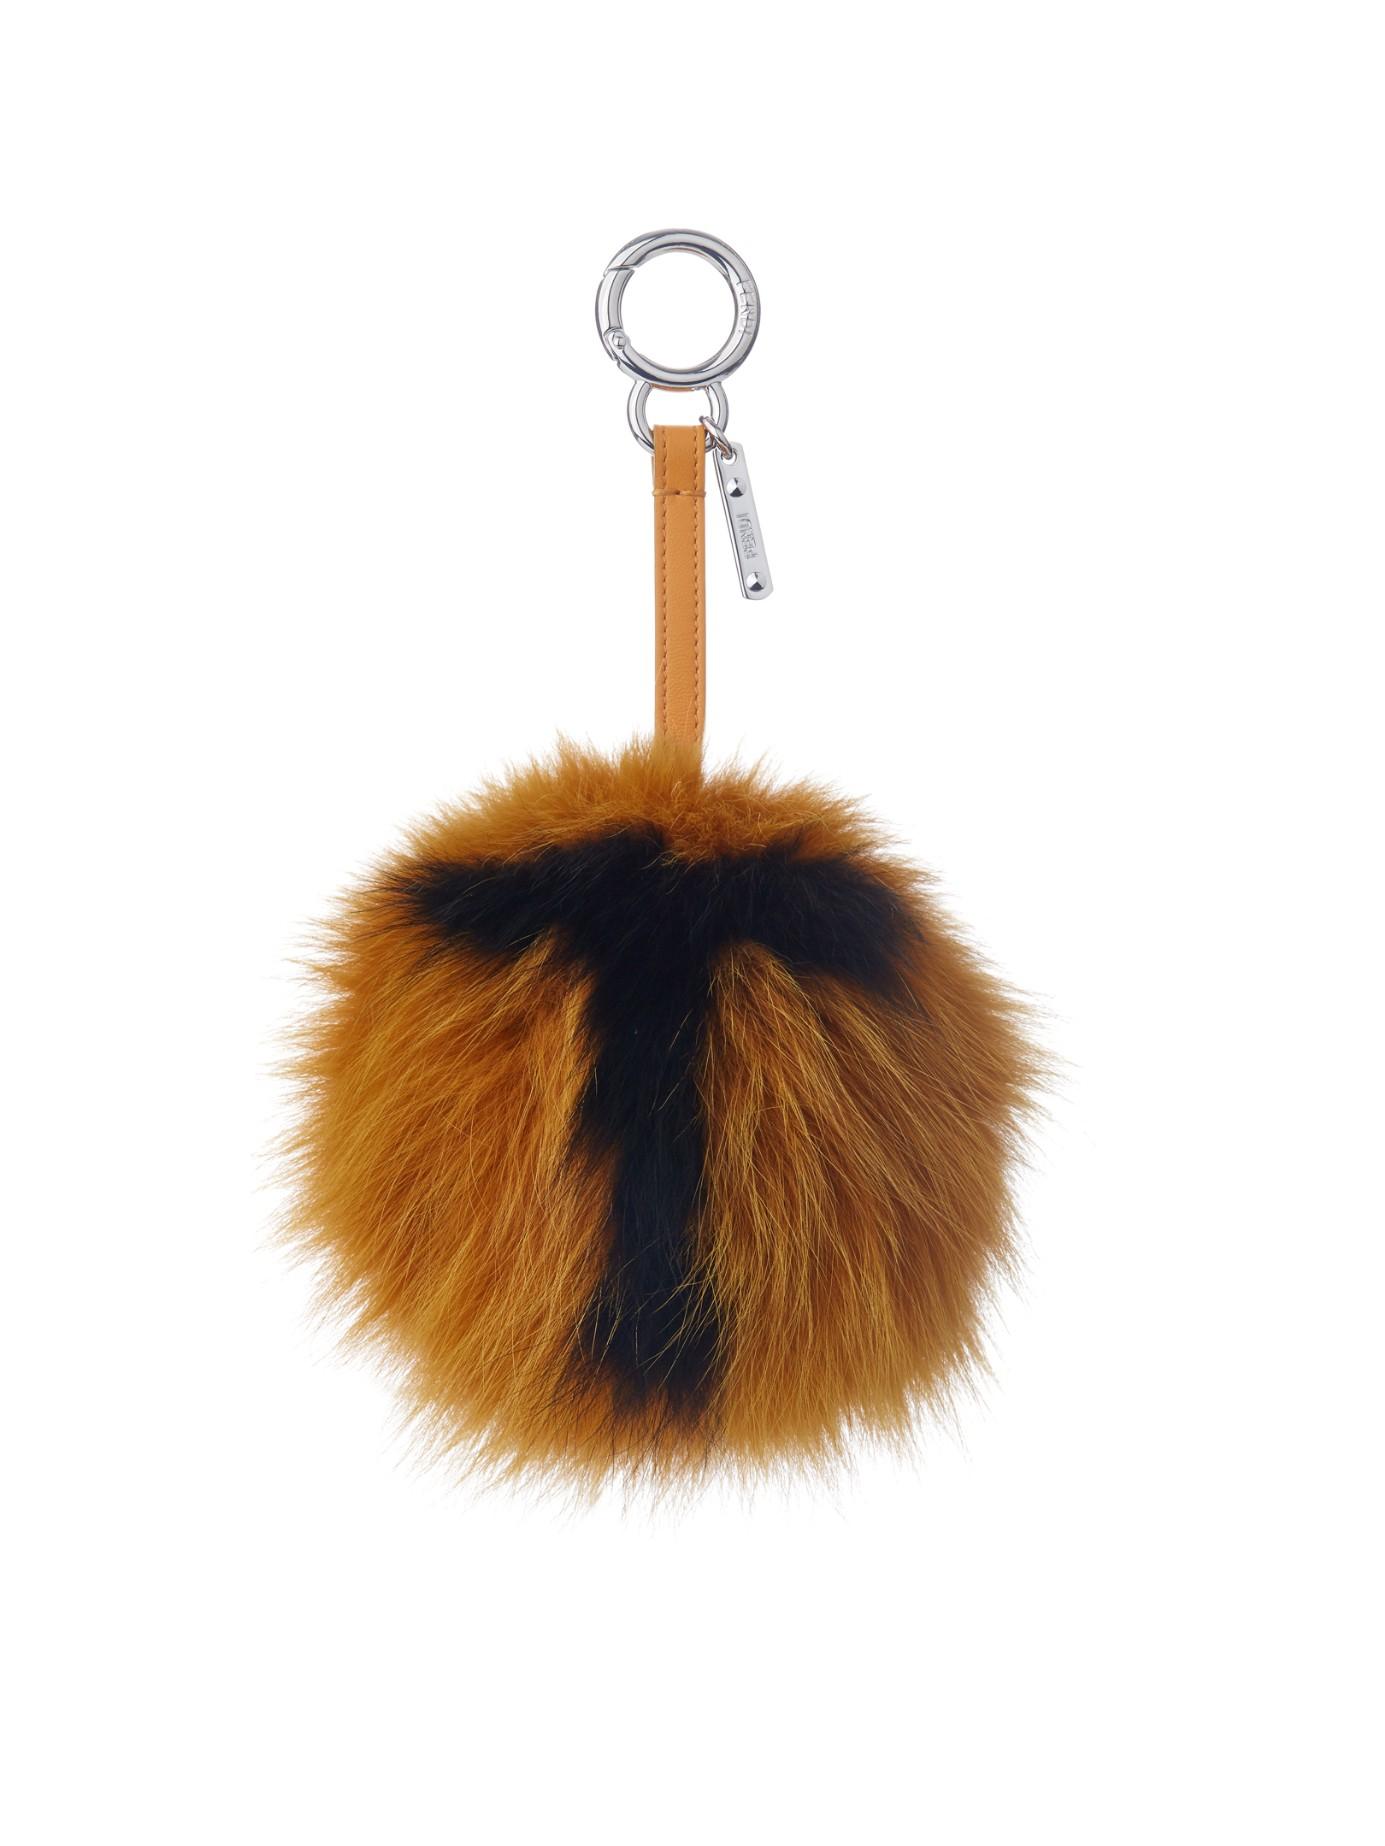 5b8d4d2af0 ... low cost lyst fendi t letter pompom fox fur bag charm in orange 9ae66  0d5cc